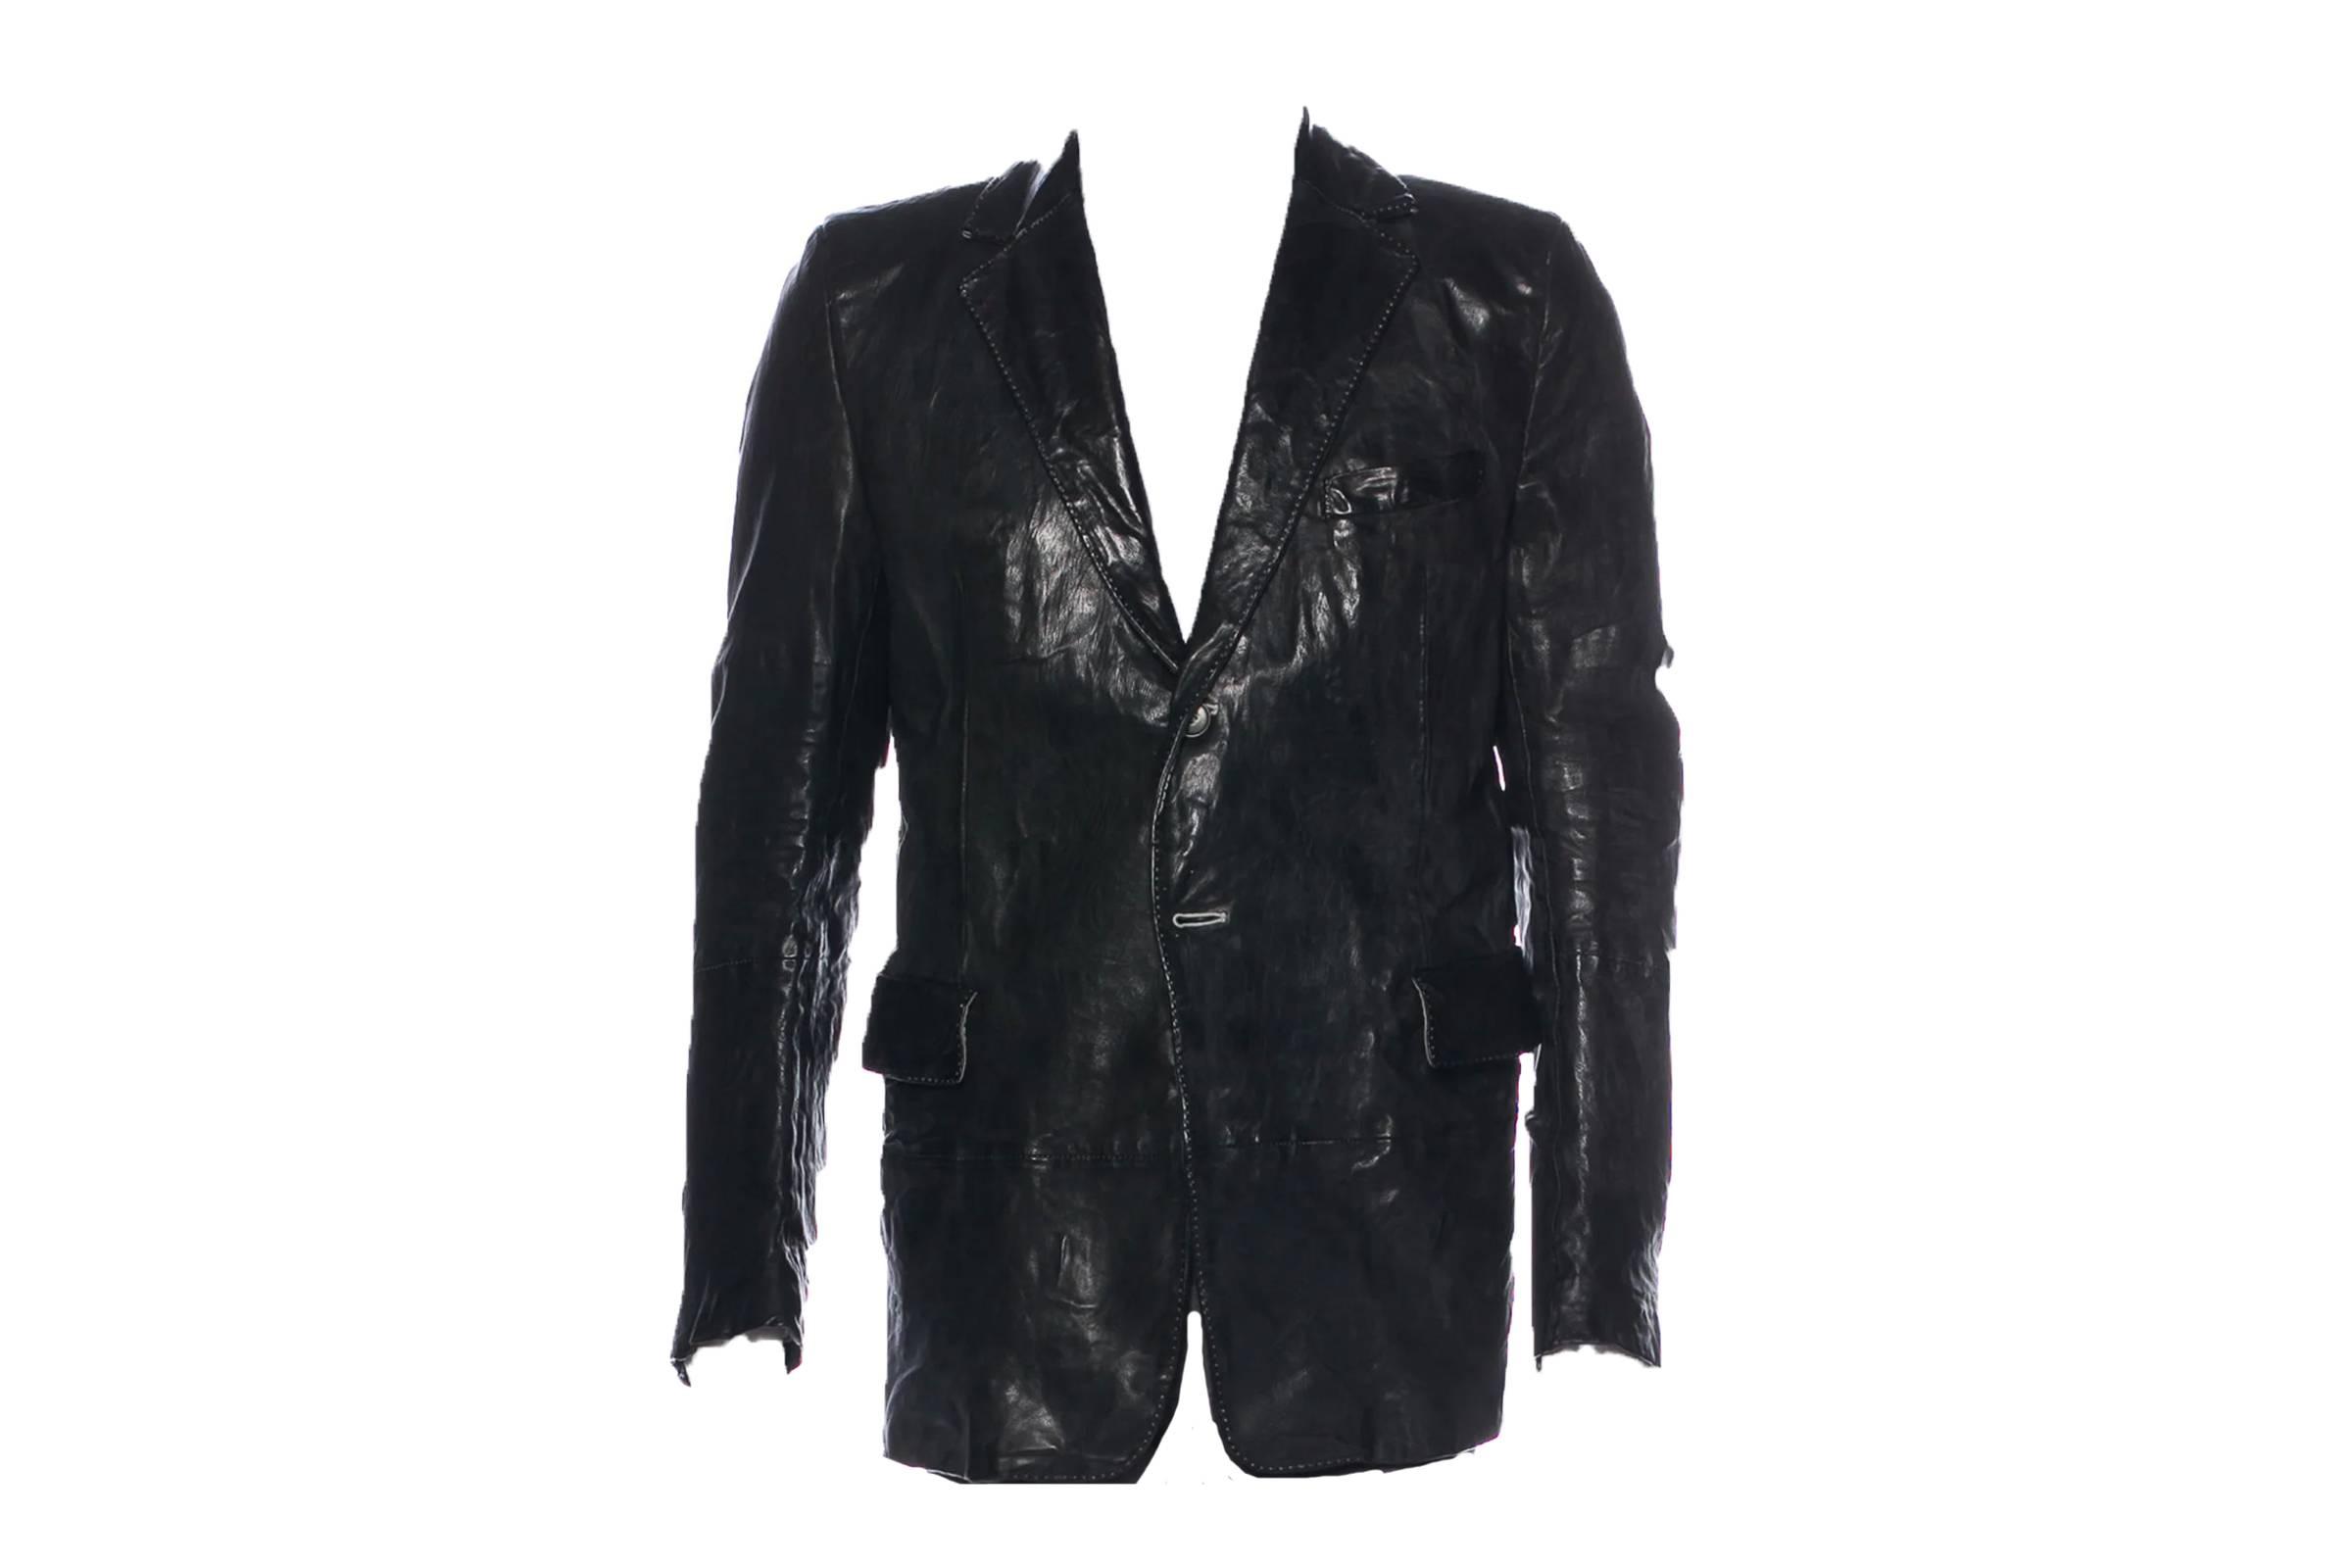 Carol Christian Poell Hammered Leather Blazer